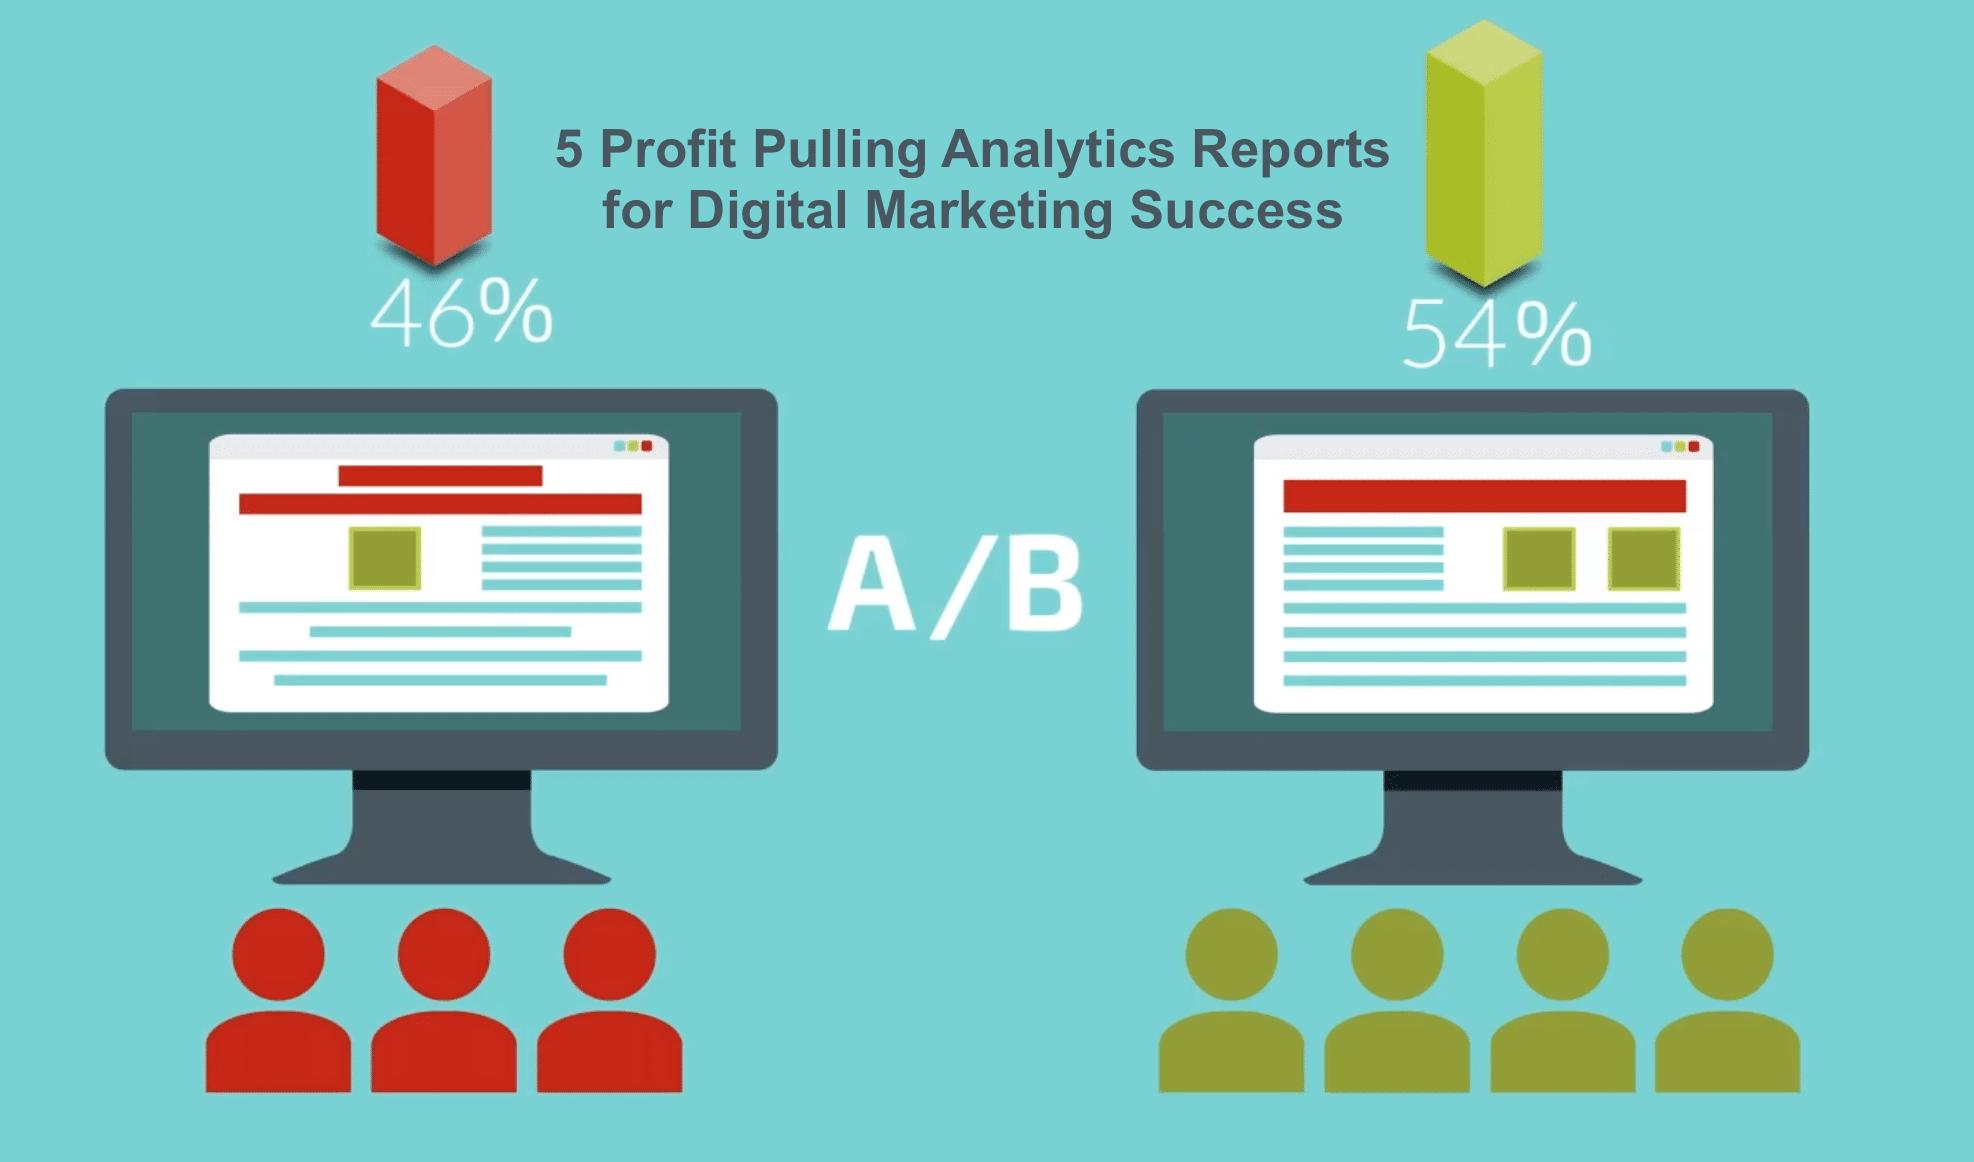 5 Profit Pulling Analytics Reports for Digital Marketing Success